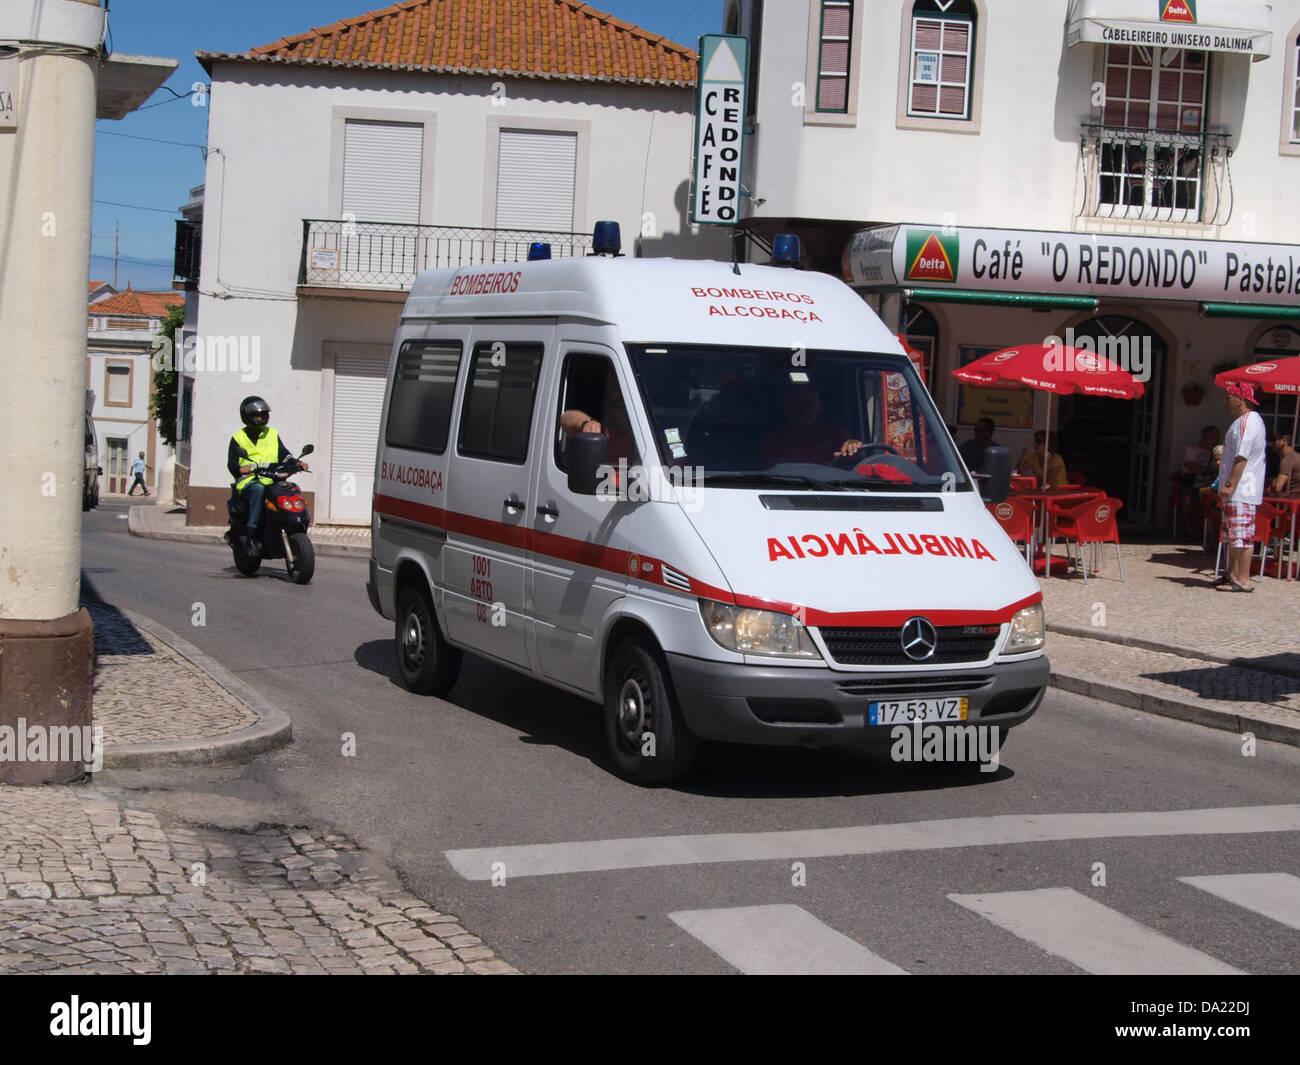 mercedes ambulance stock photos mercedes ambulance stock images